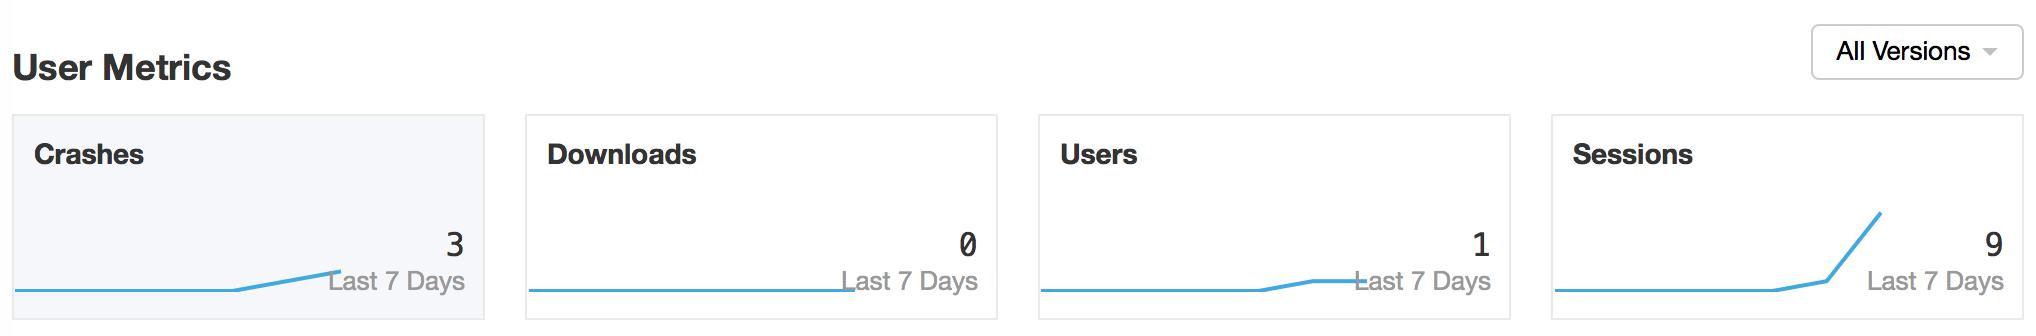 User metrics